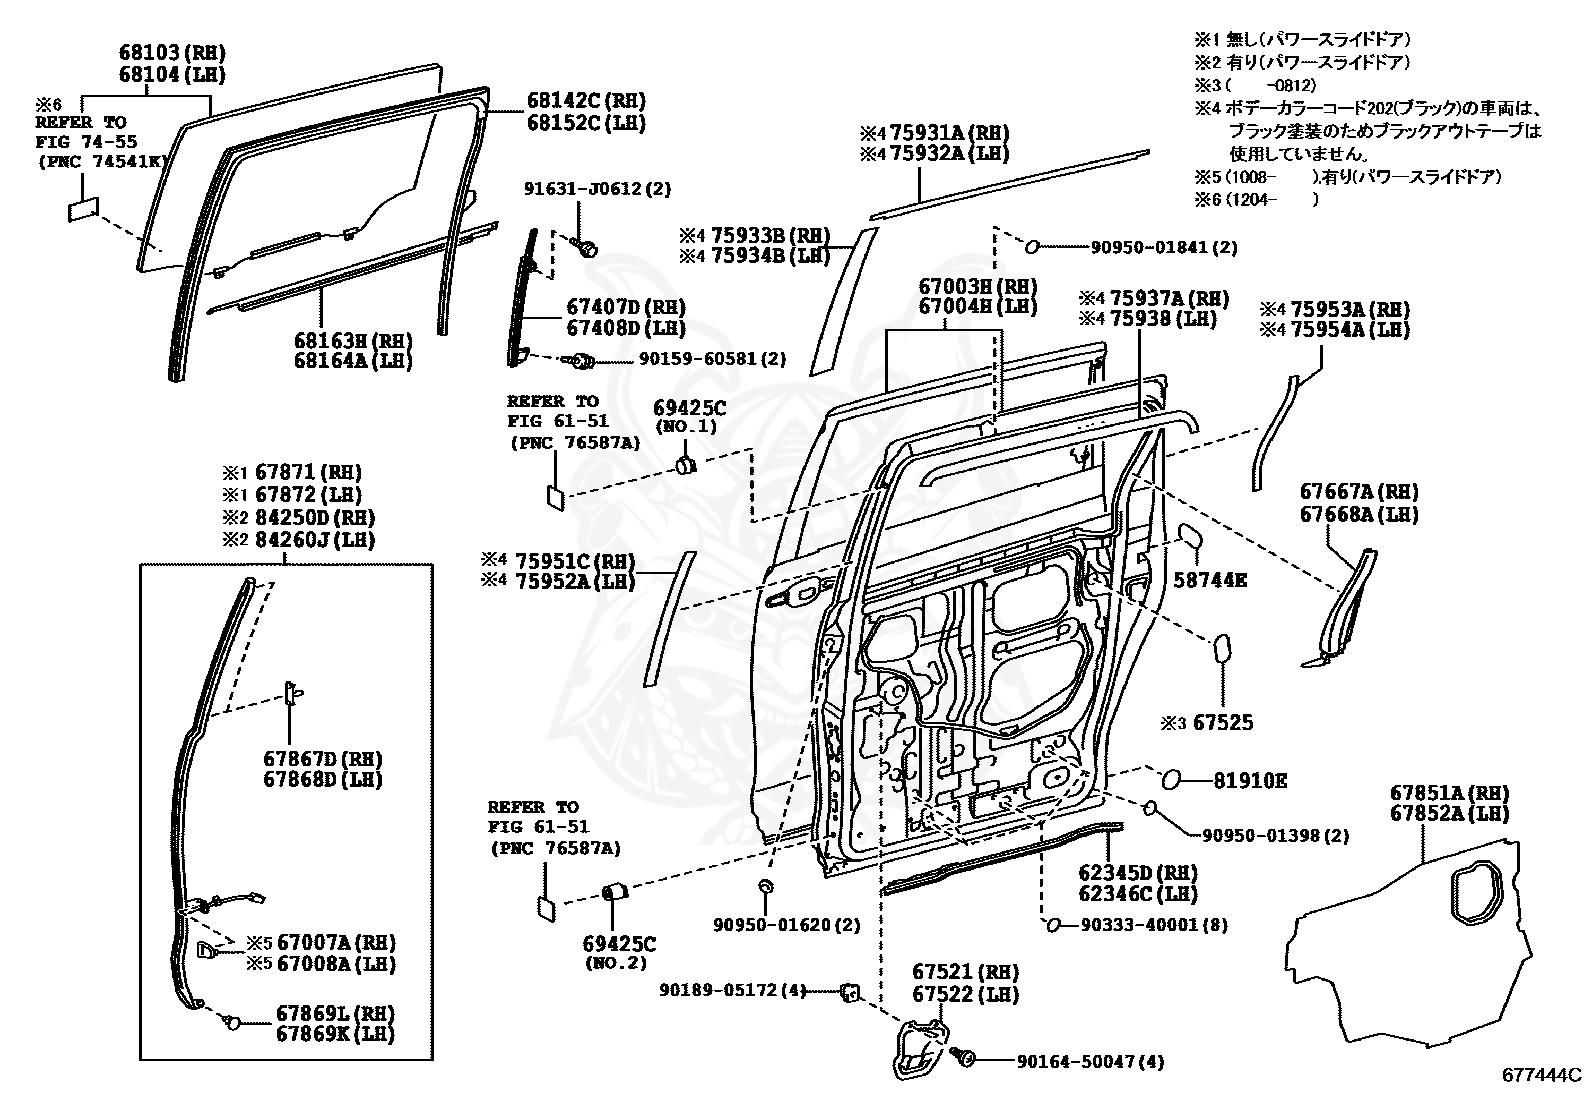 toyota 1 8 diagram 68164 28040 toyota weatherstrip  rear door glass  outer lh  68164 28040 toyota weatherstrip